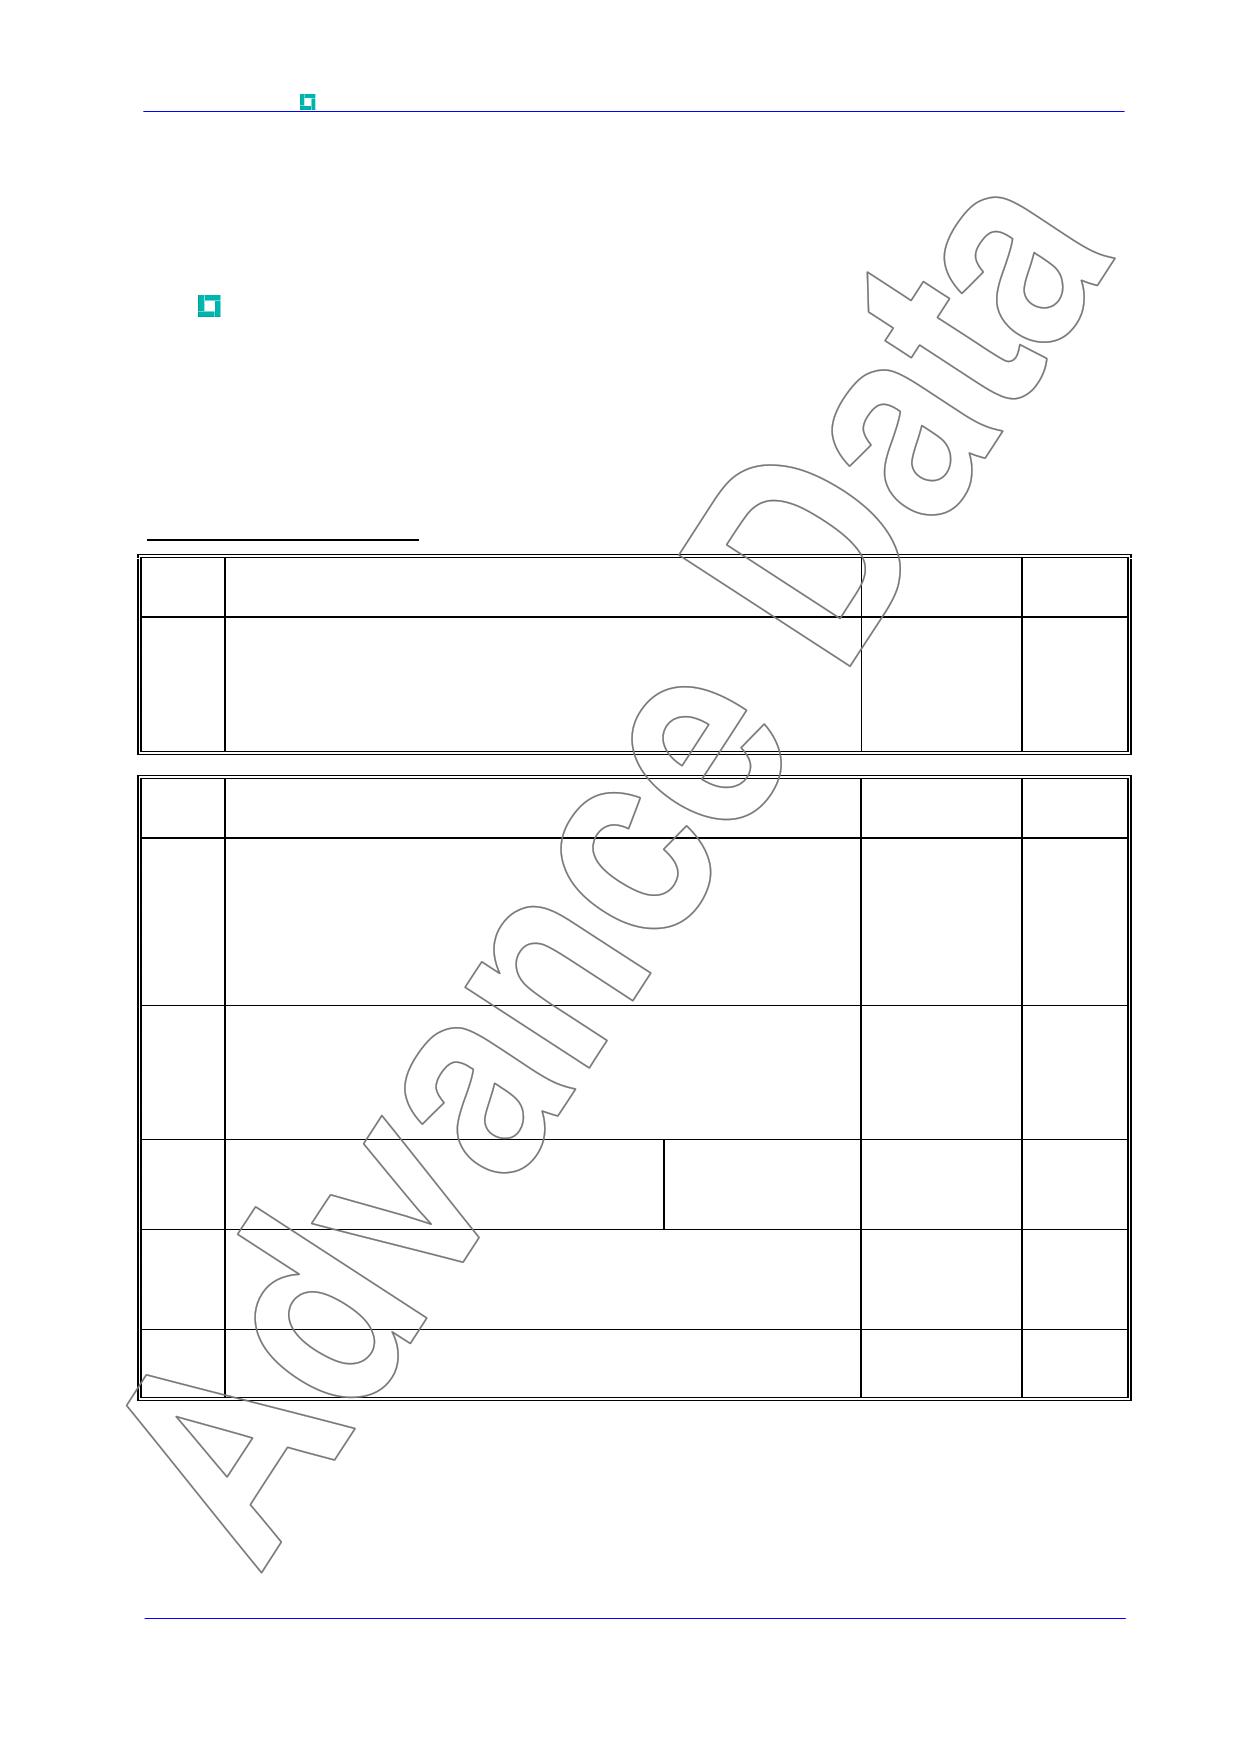 K0885NC440 datasheet